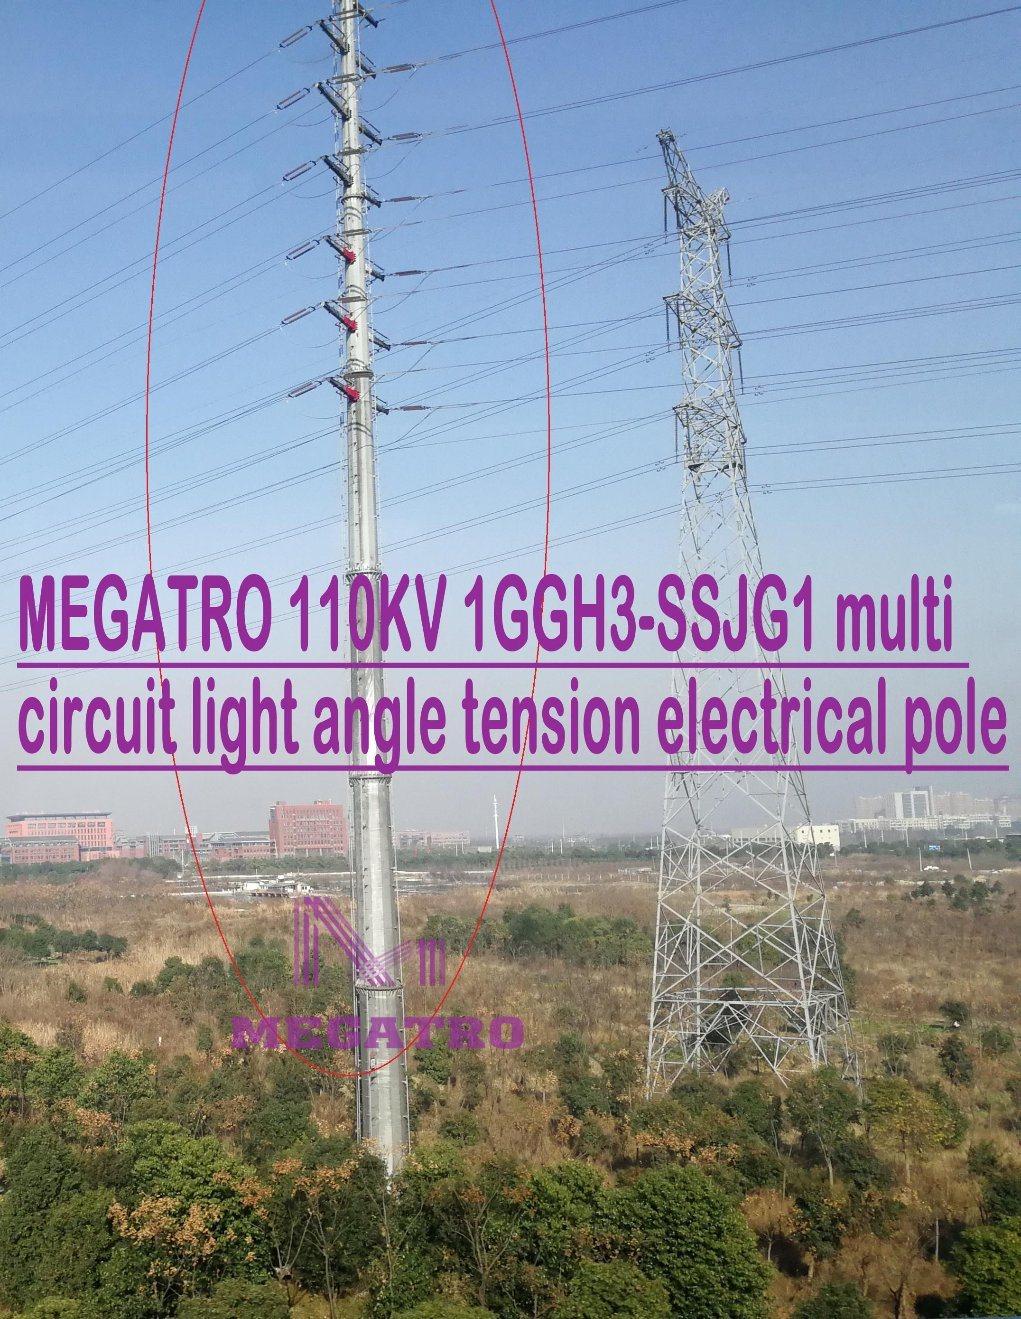 hight resolution of china megatro 110kv 1ggh3 ssjg1 multi circuit light angle tension electrical pole china 110kkv transmission tangent tower 110kv overhead line steel tower